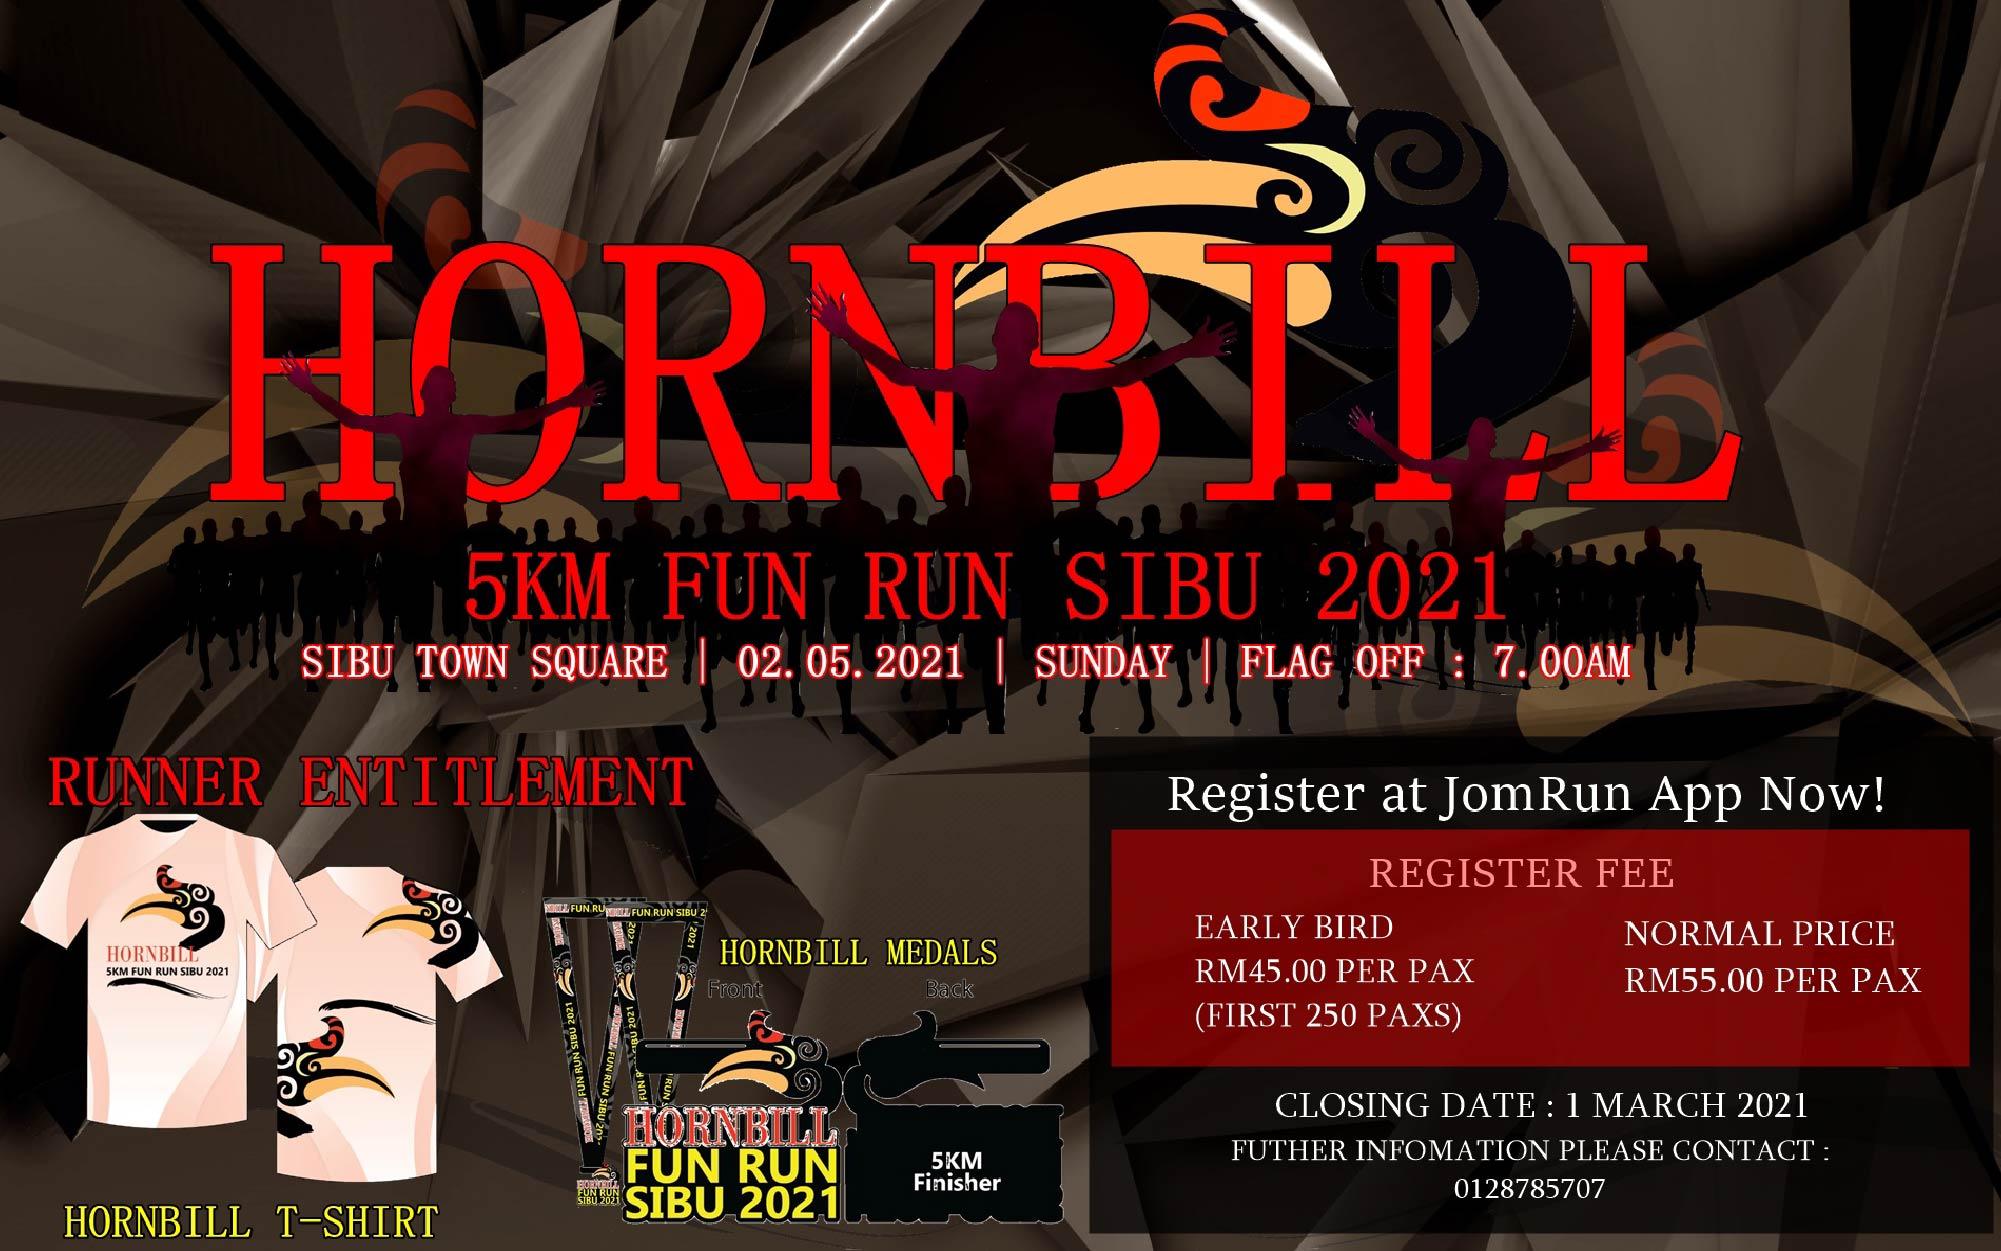 Hornbill 5km Fun Run Sibu 2021